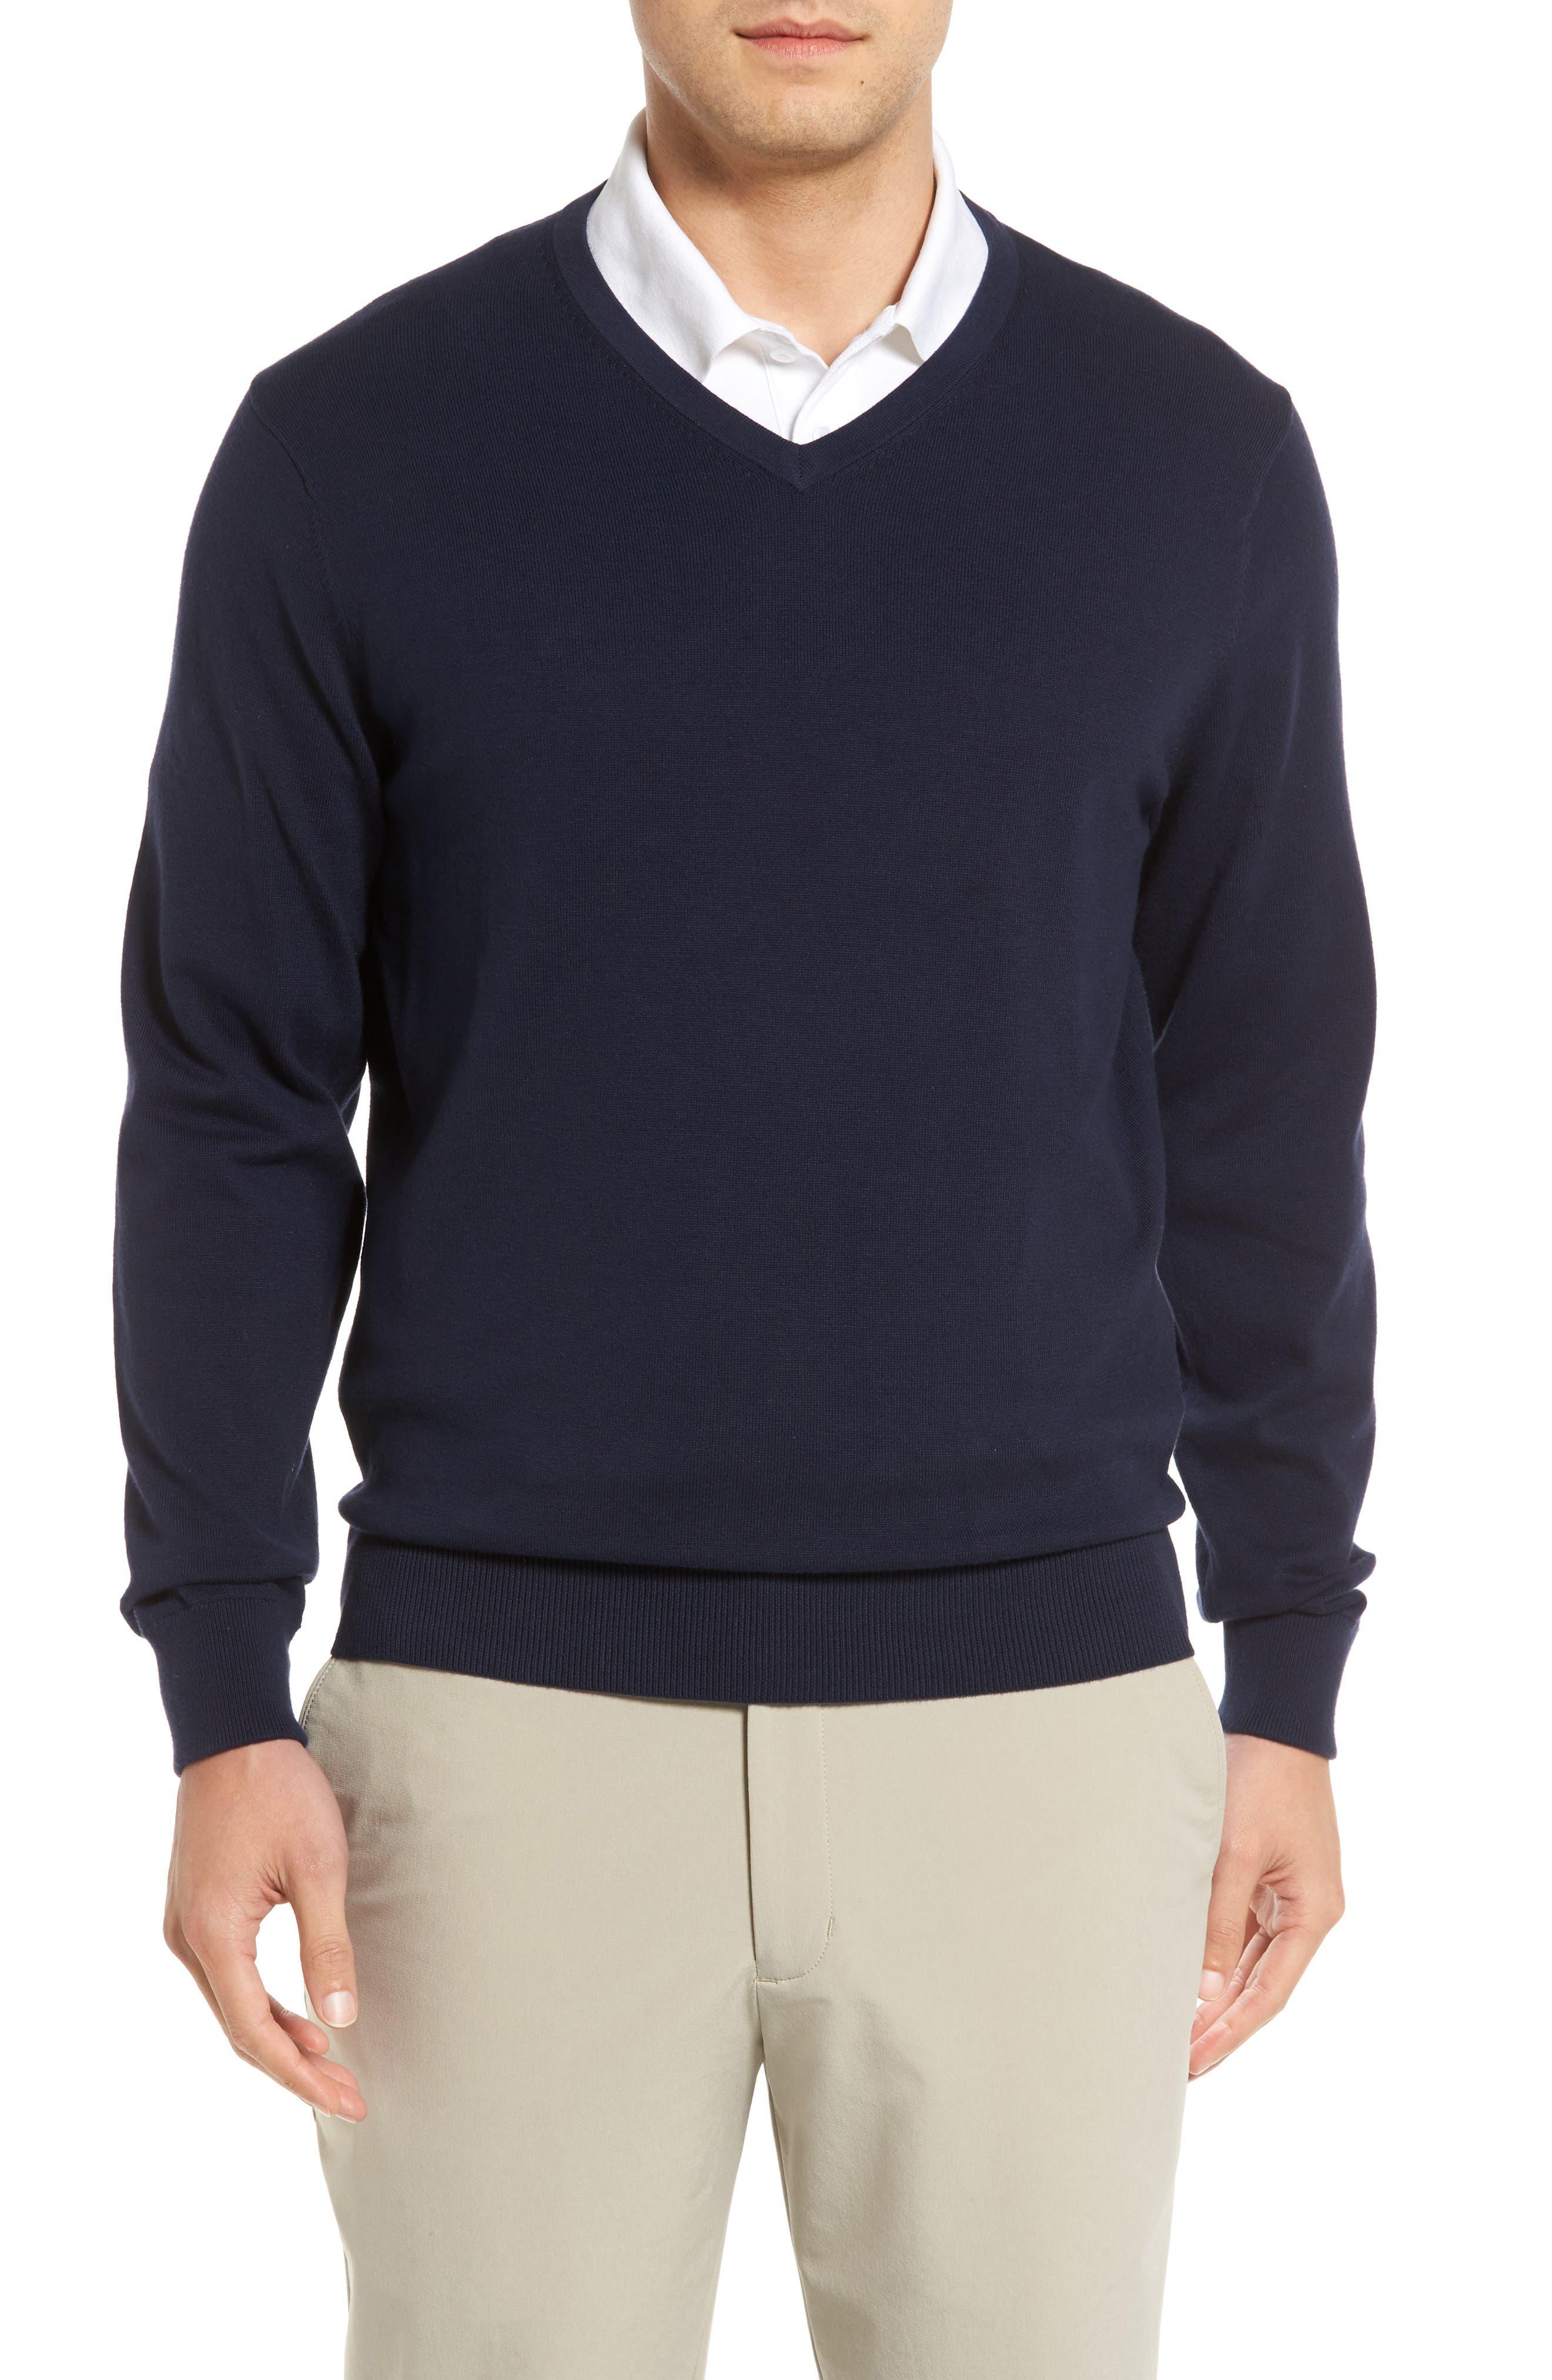 CUTTER & BUCK Lakemont V-Neck Sweater